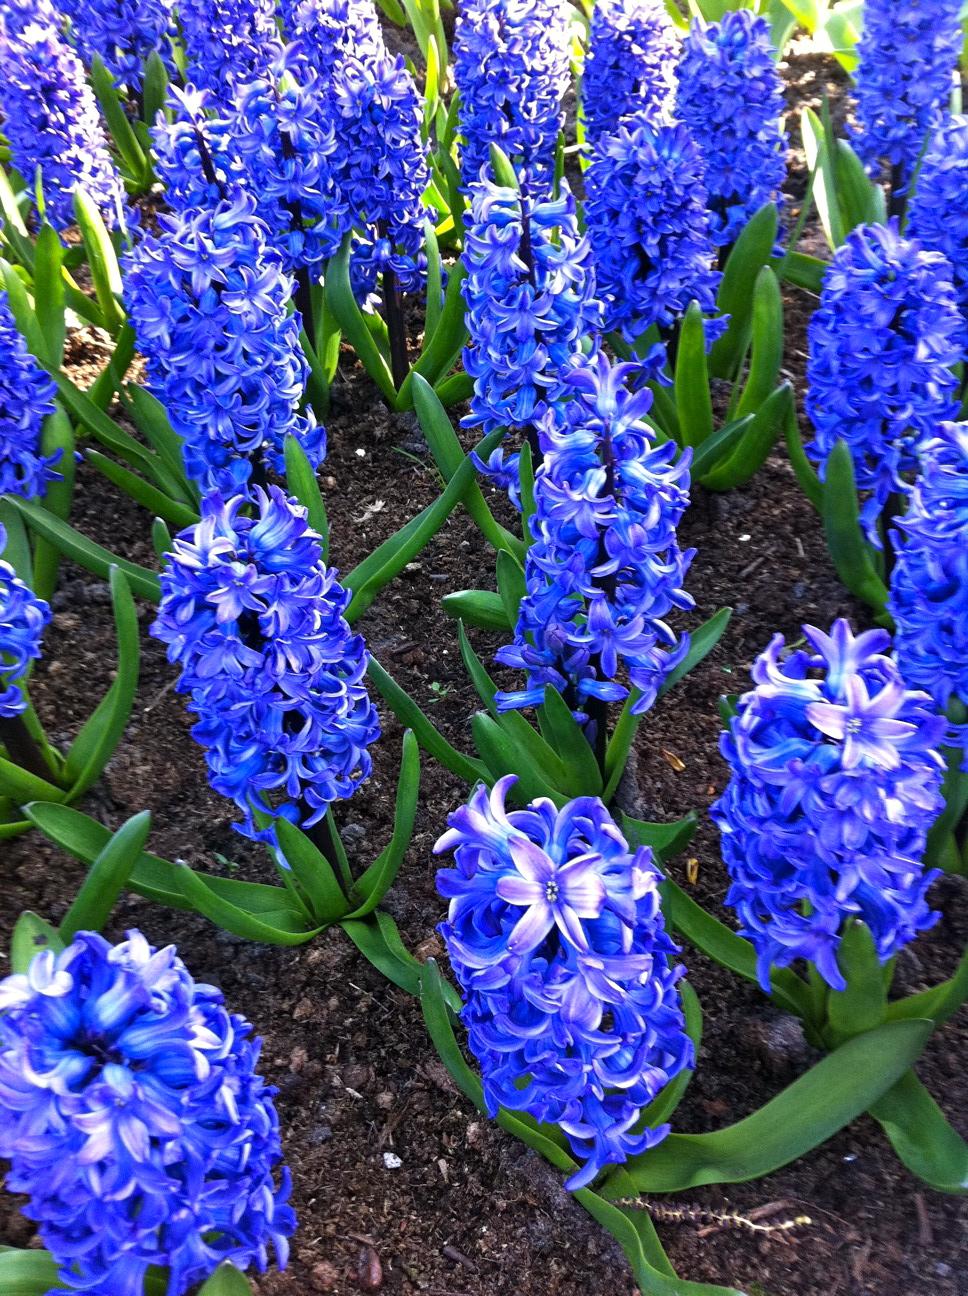 2011-04-21-photo35.jpg